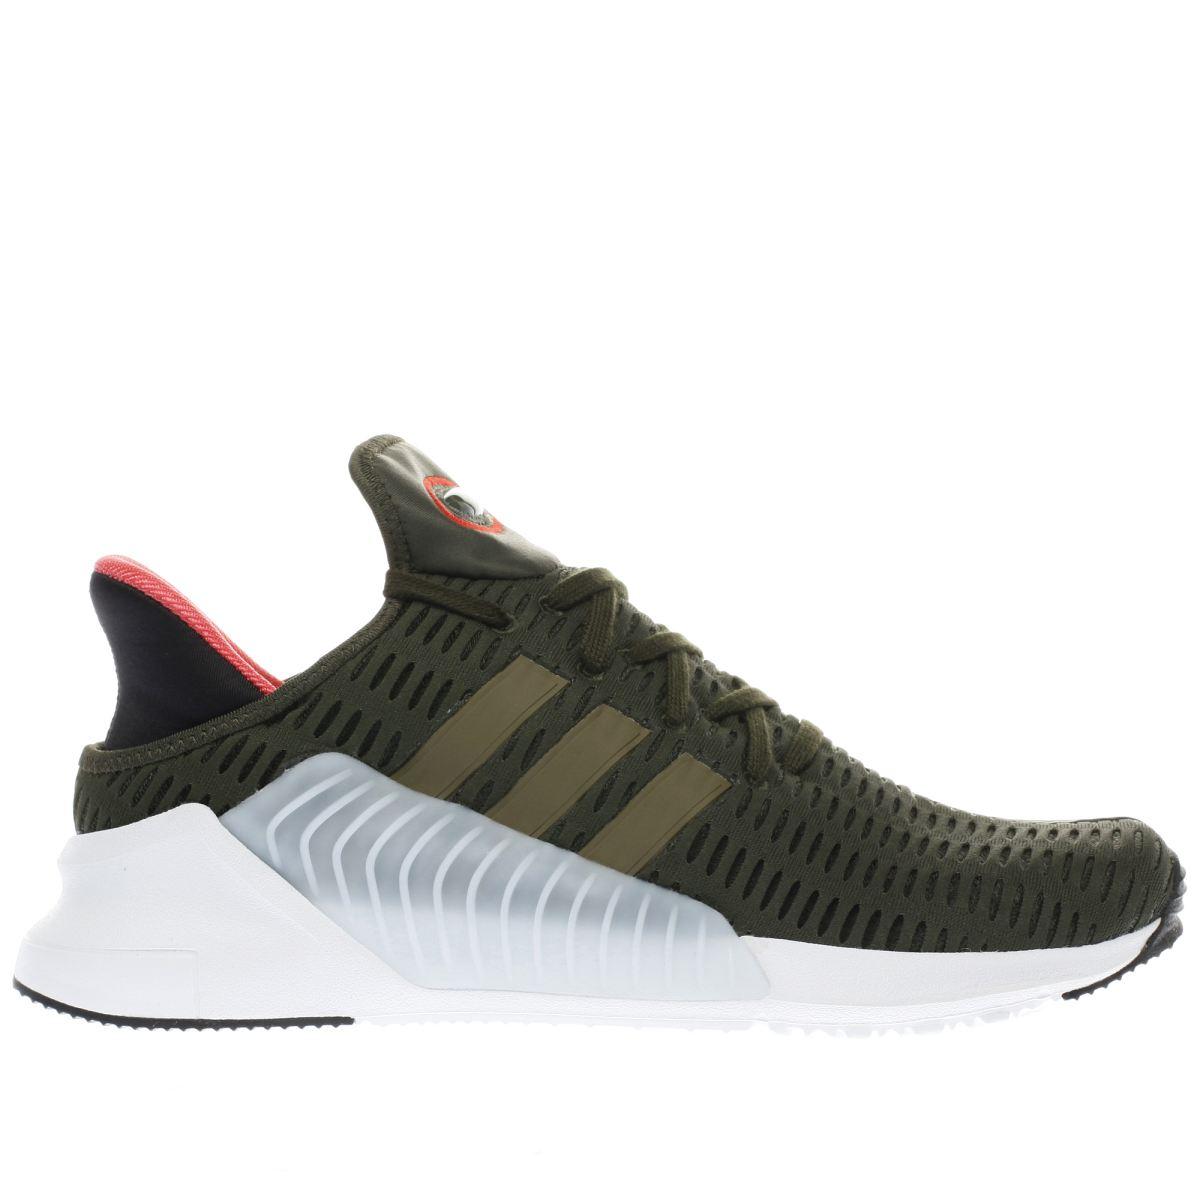 adidas khaki climacool 02/17 trainers